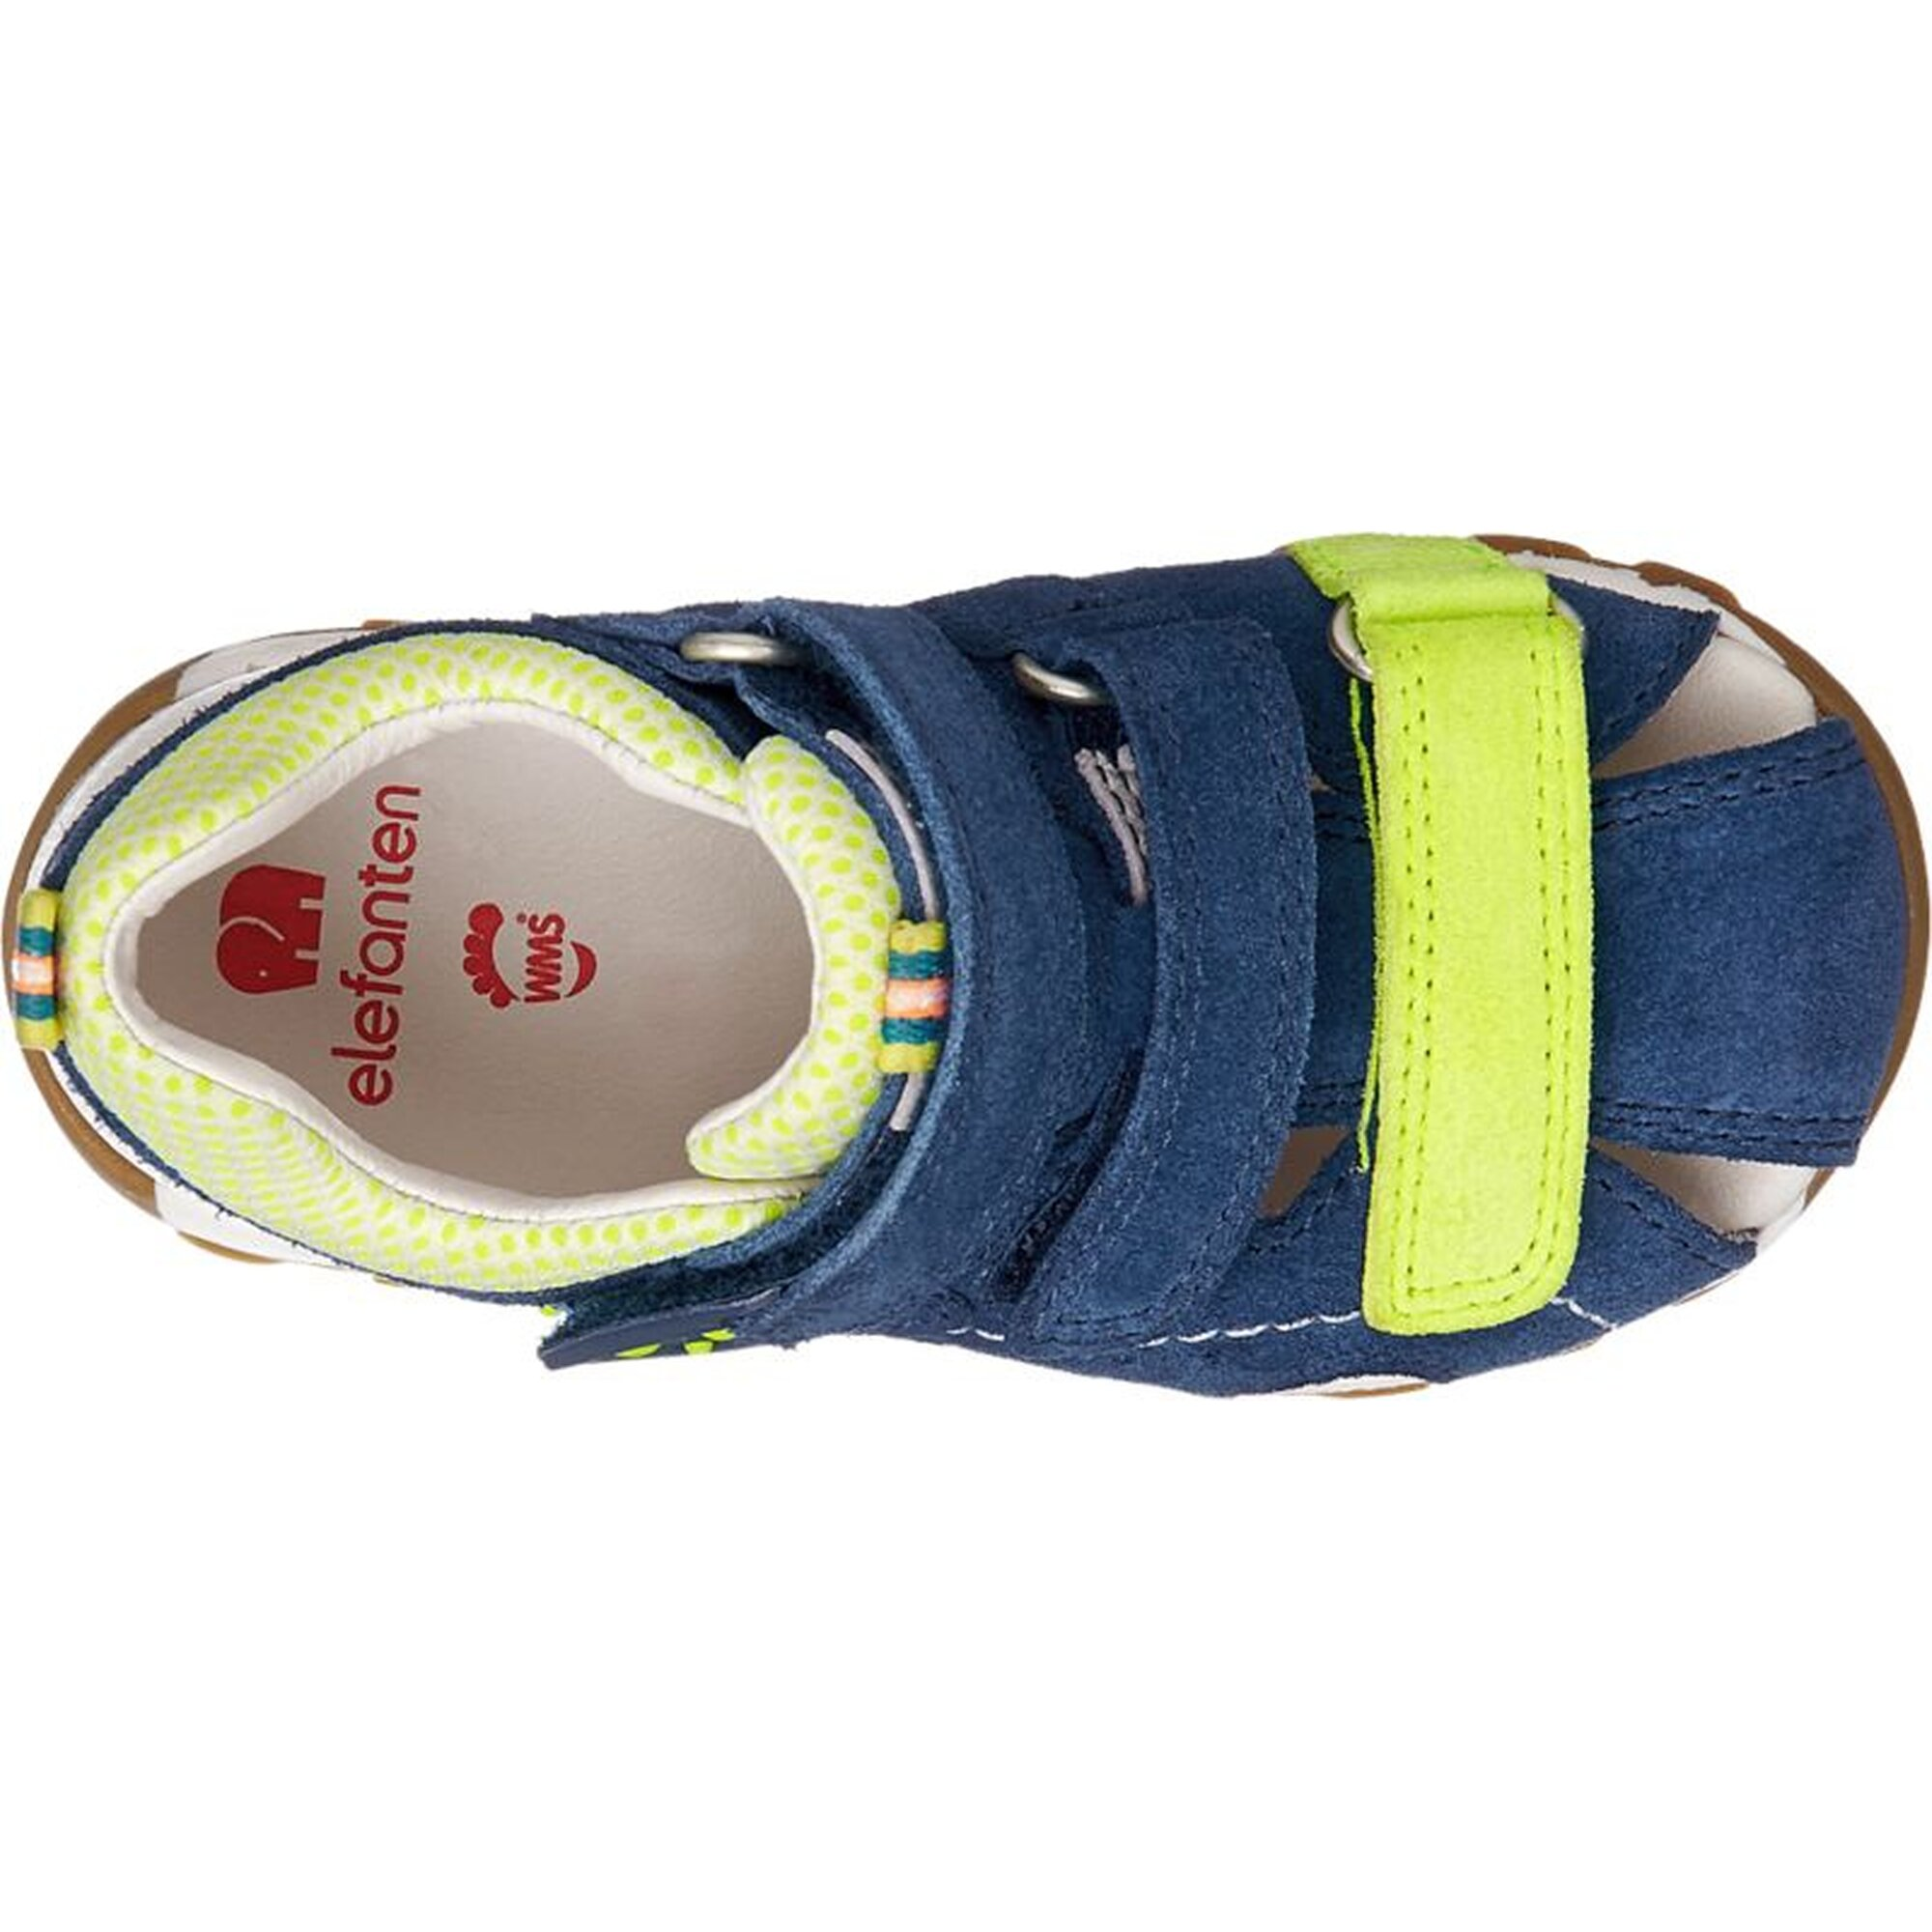 elefanten-sandale-weite-mittel, 44.90 EUR @ babywalz-de